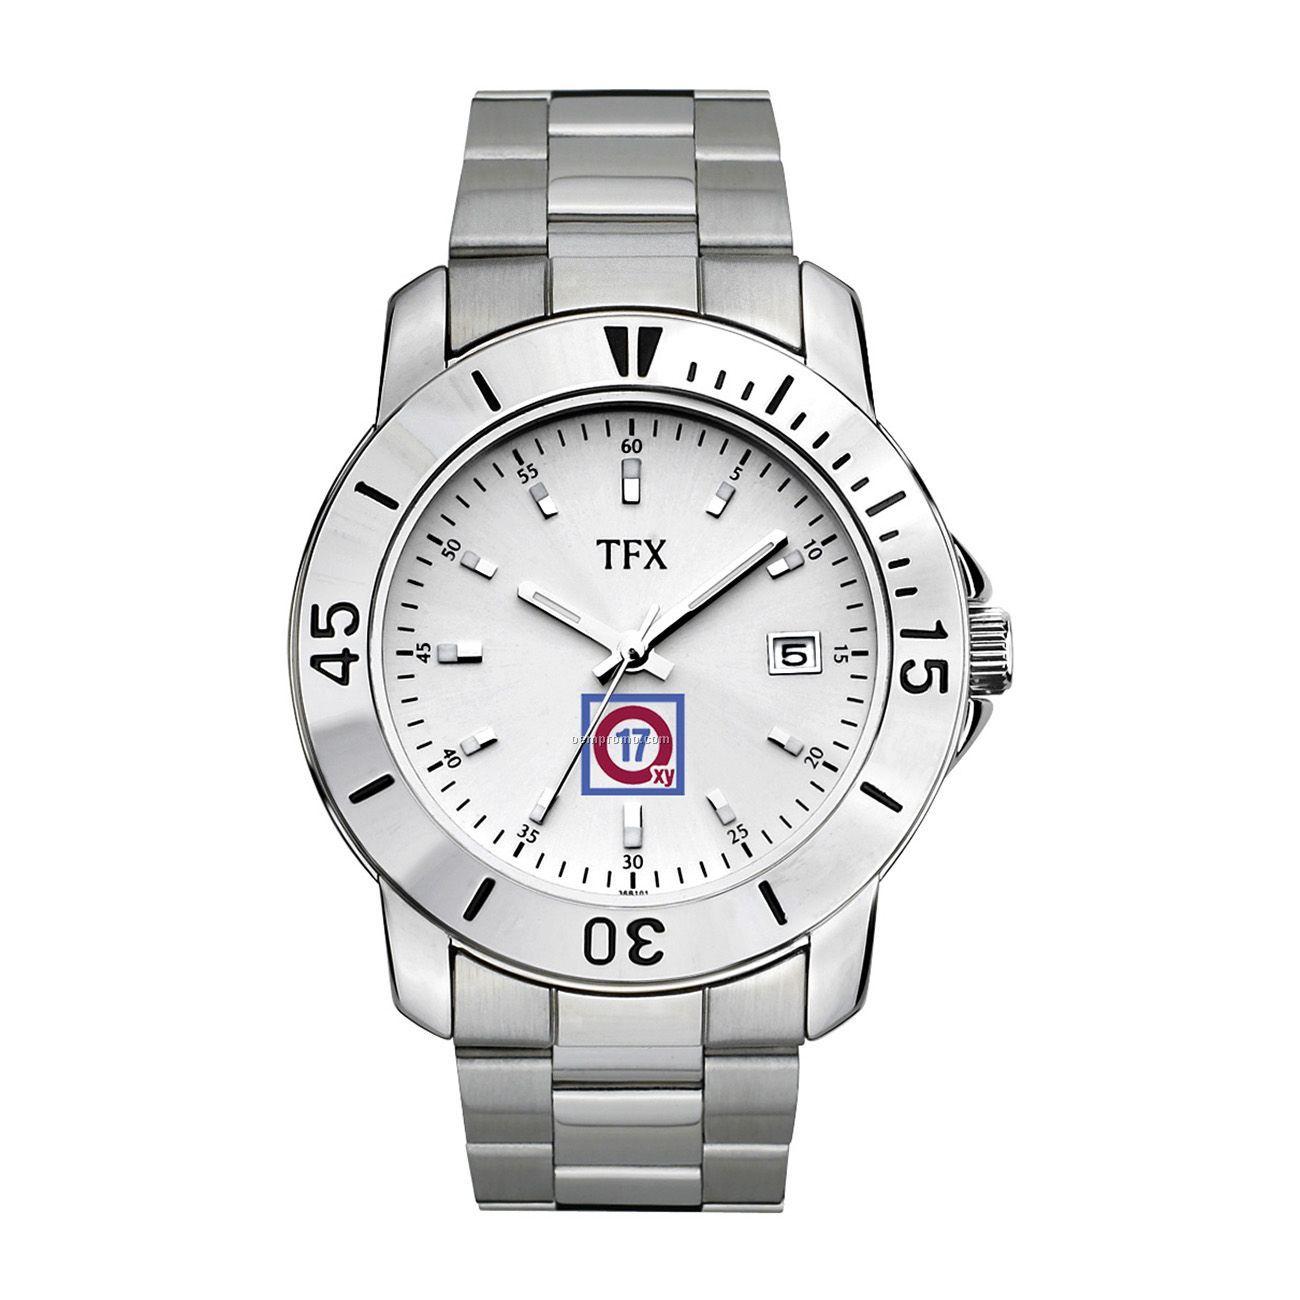 Tfx Distributed By Bulova- Men's Analog Wrist Watch